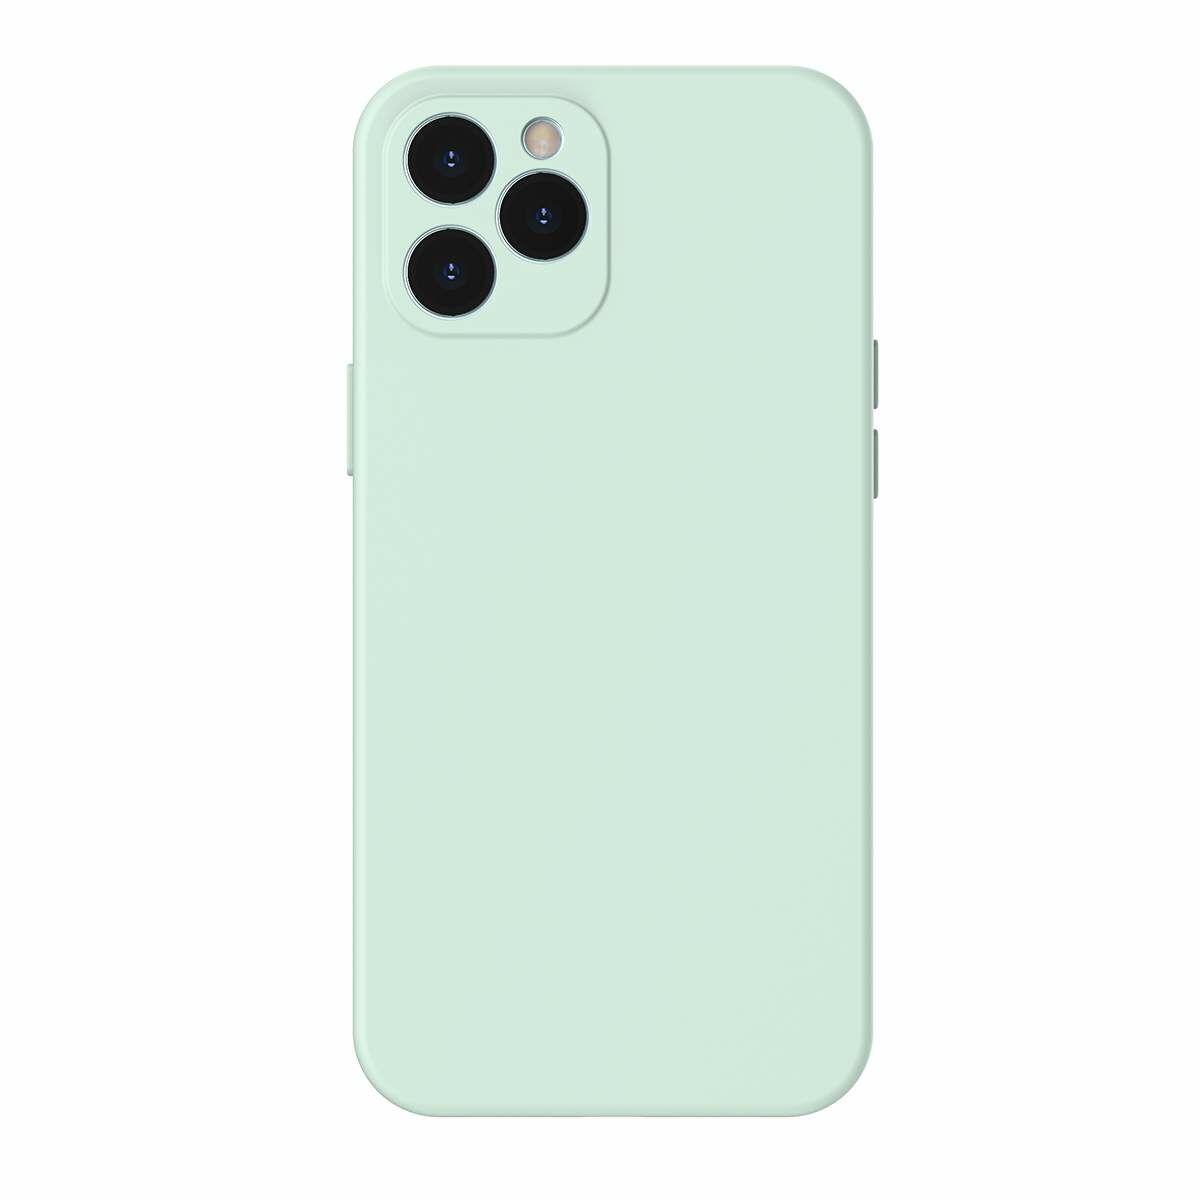 Baseus iPhone 12 Pro Max, Liquid Sillica Gel, menta zöld (WIAPIPH67N-YT6B)